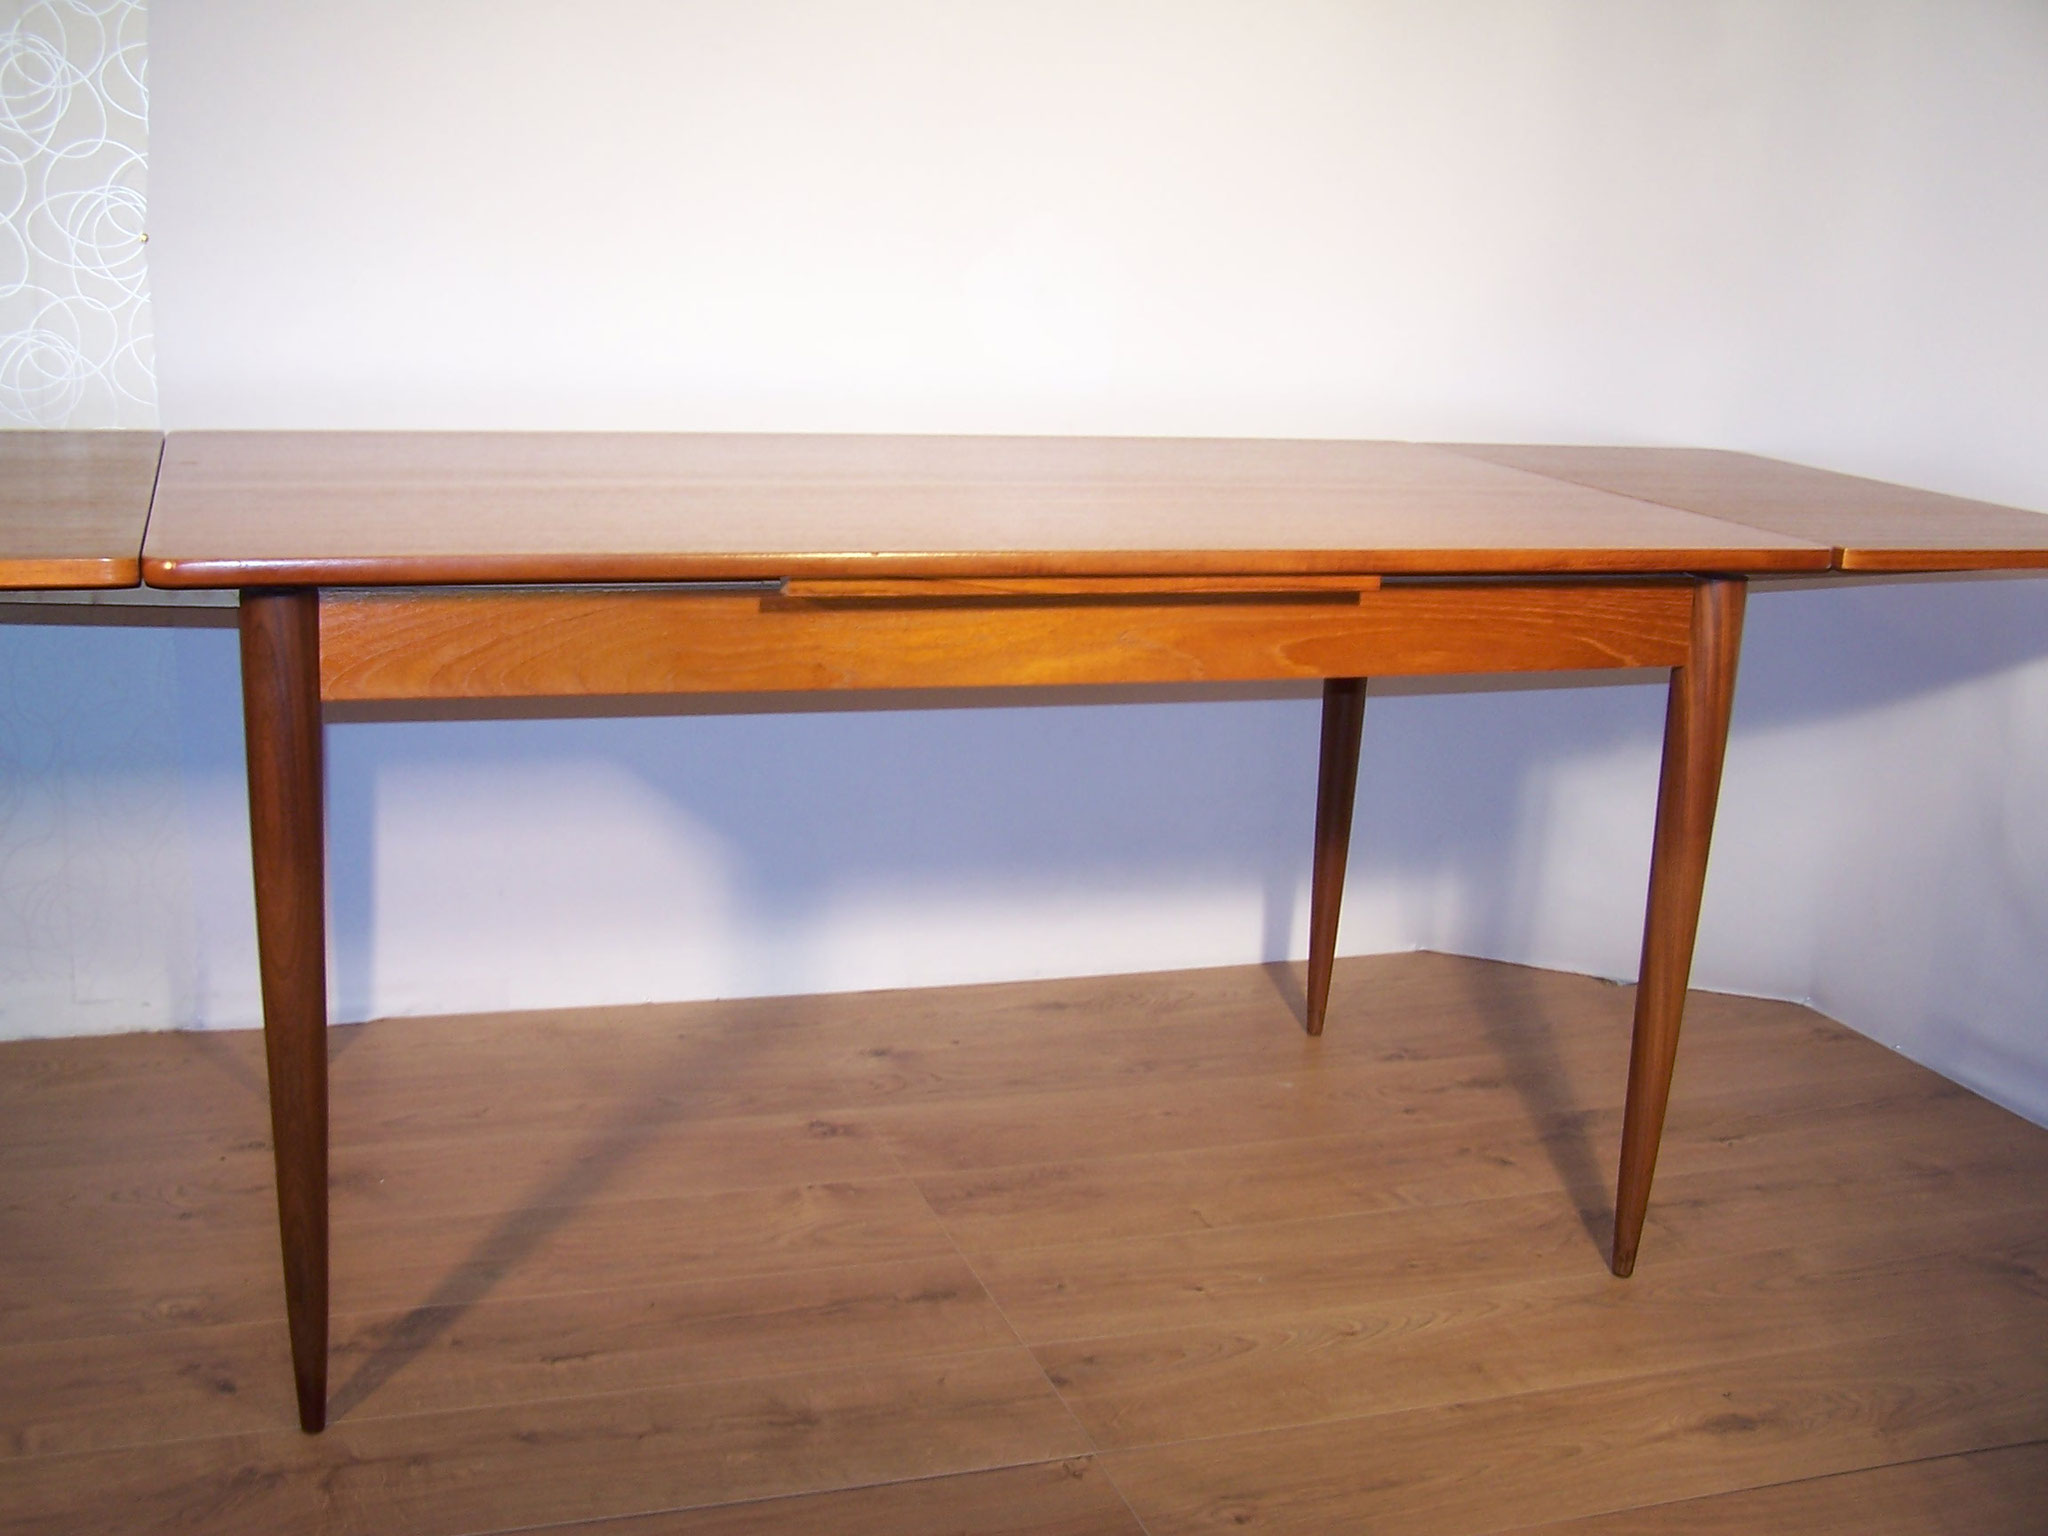 Table scandinave en teck annees 1960 majdeltier - Boutique scandinave en ligne ...